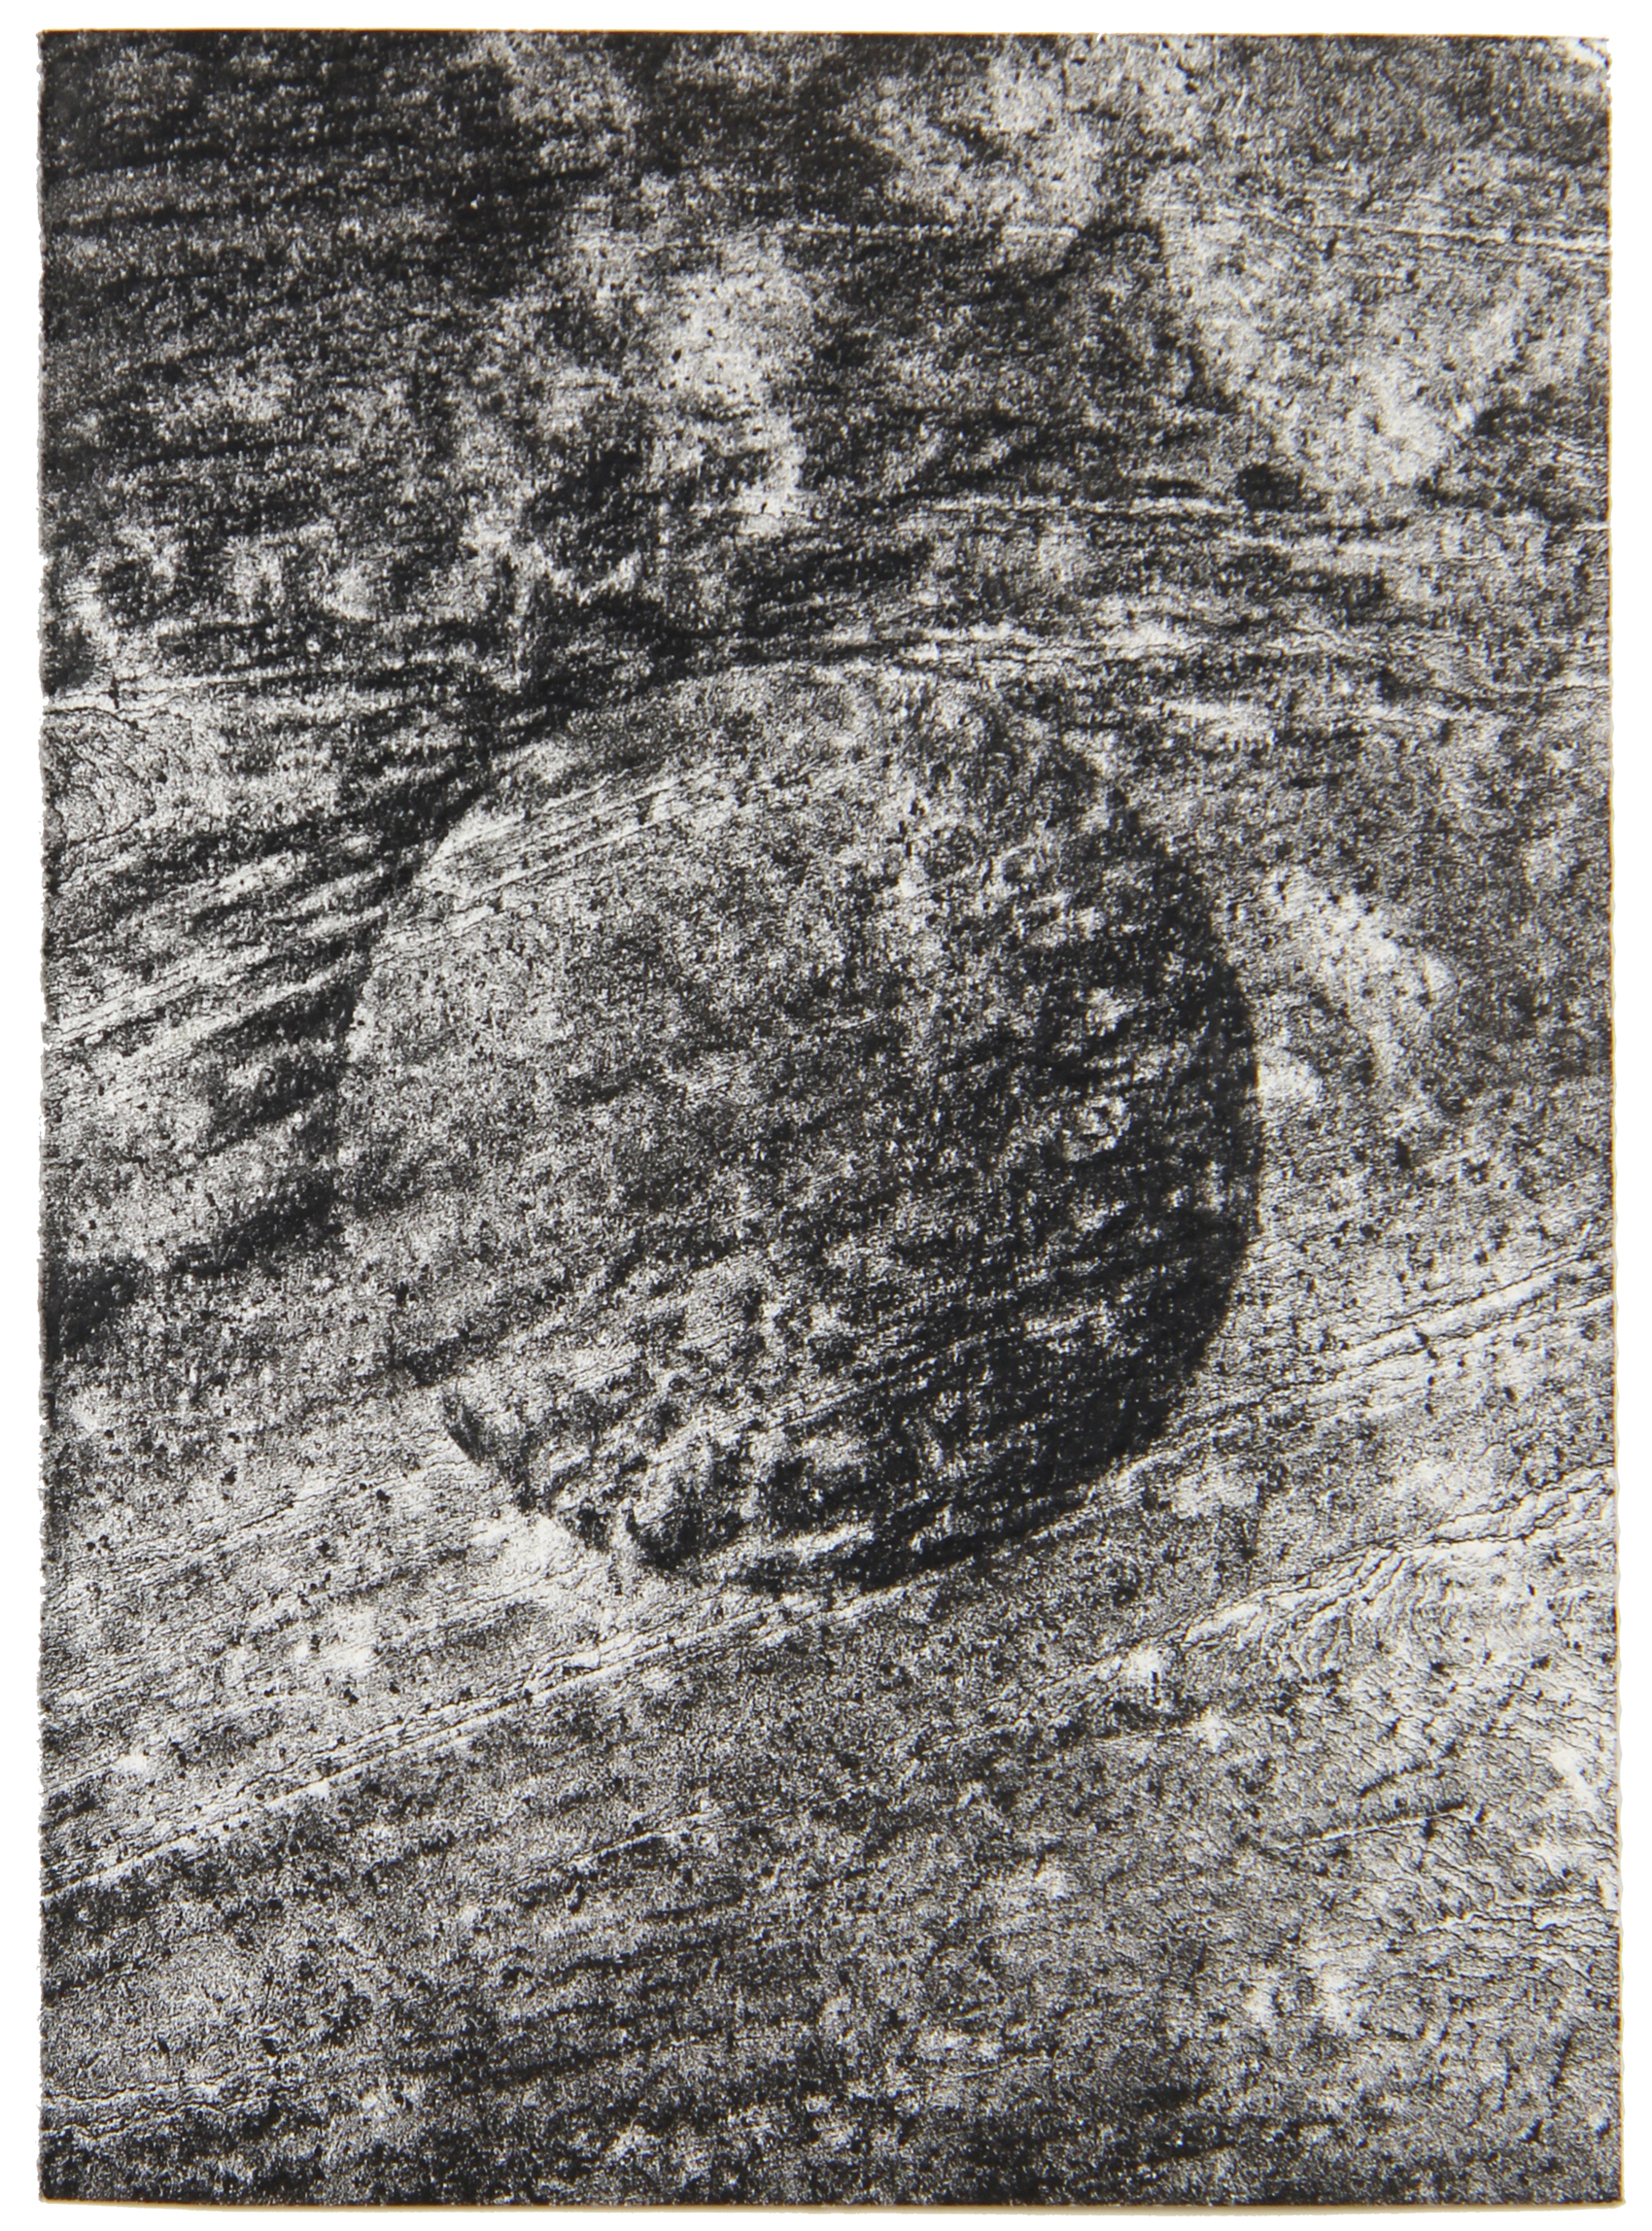 Circle 148 x 105 cm gemengde techniek op papier 2021